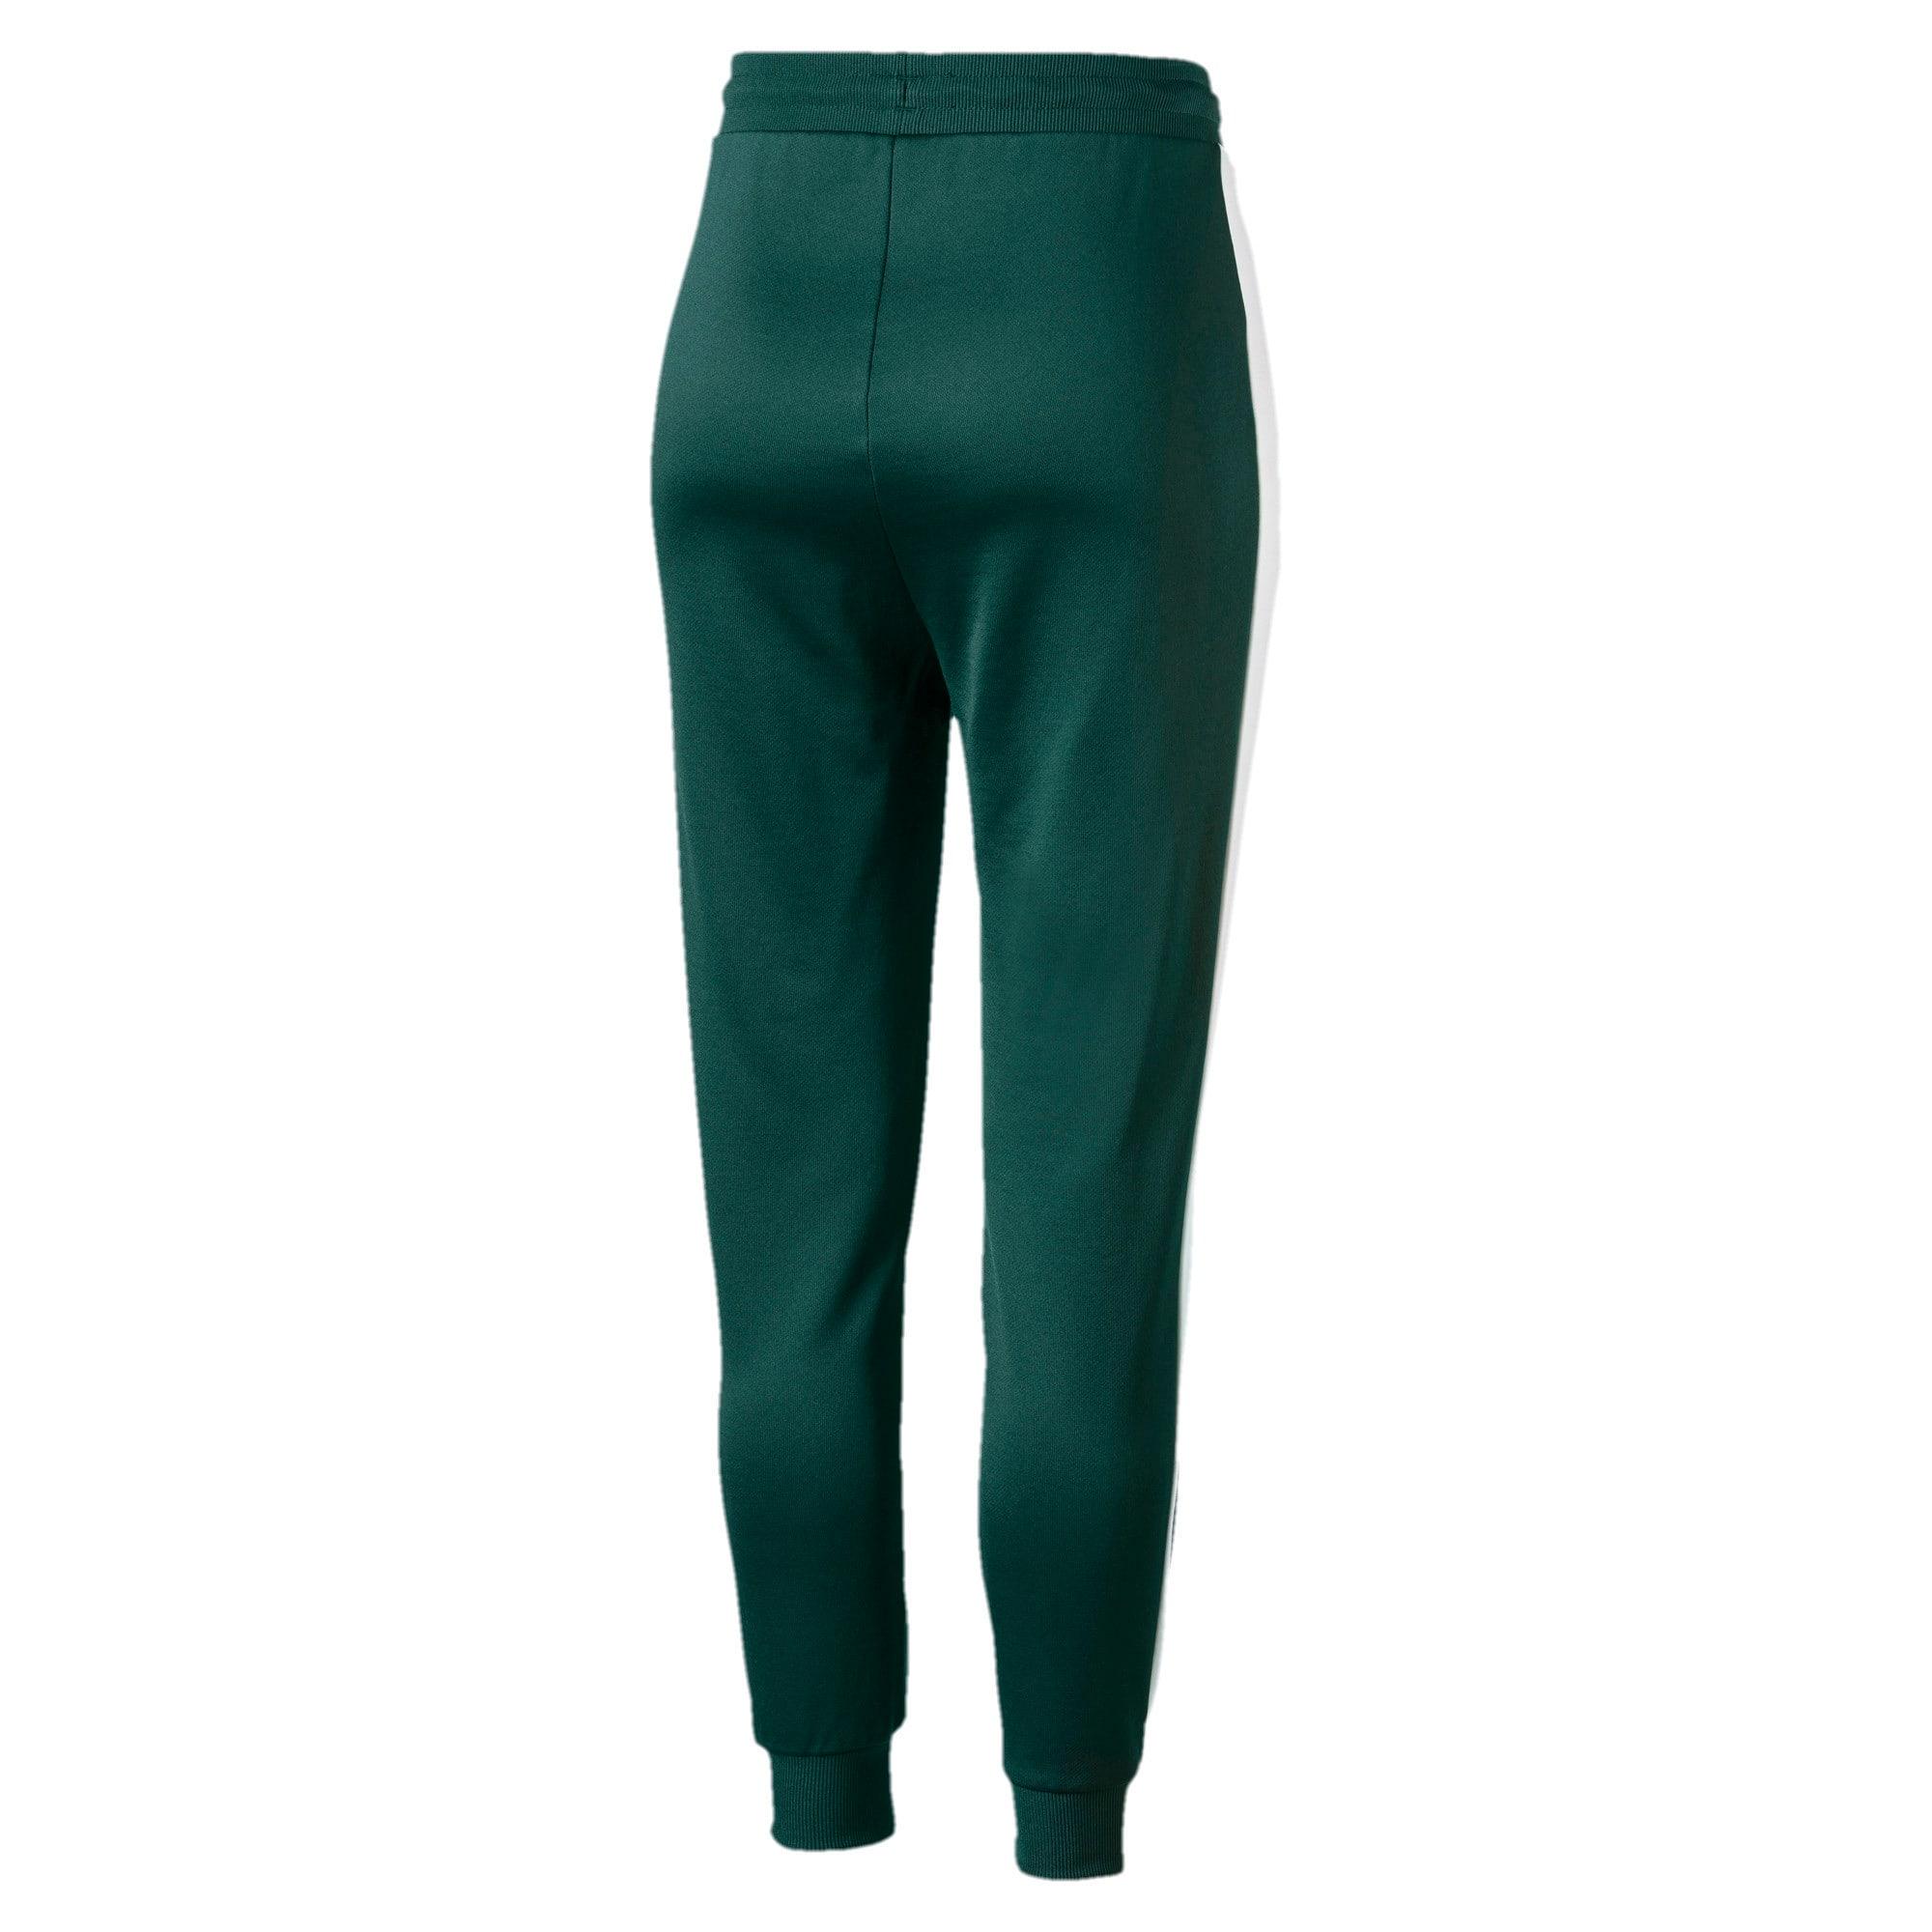 Thumbnail 5 of Classics T7 Knitted Women's Track Pants, Ponderosa Pine, medium-IND